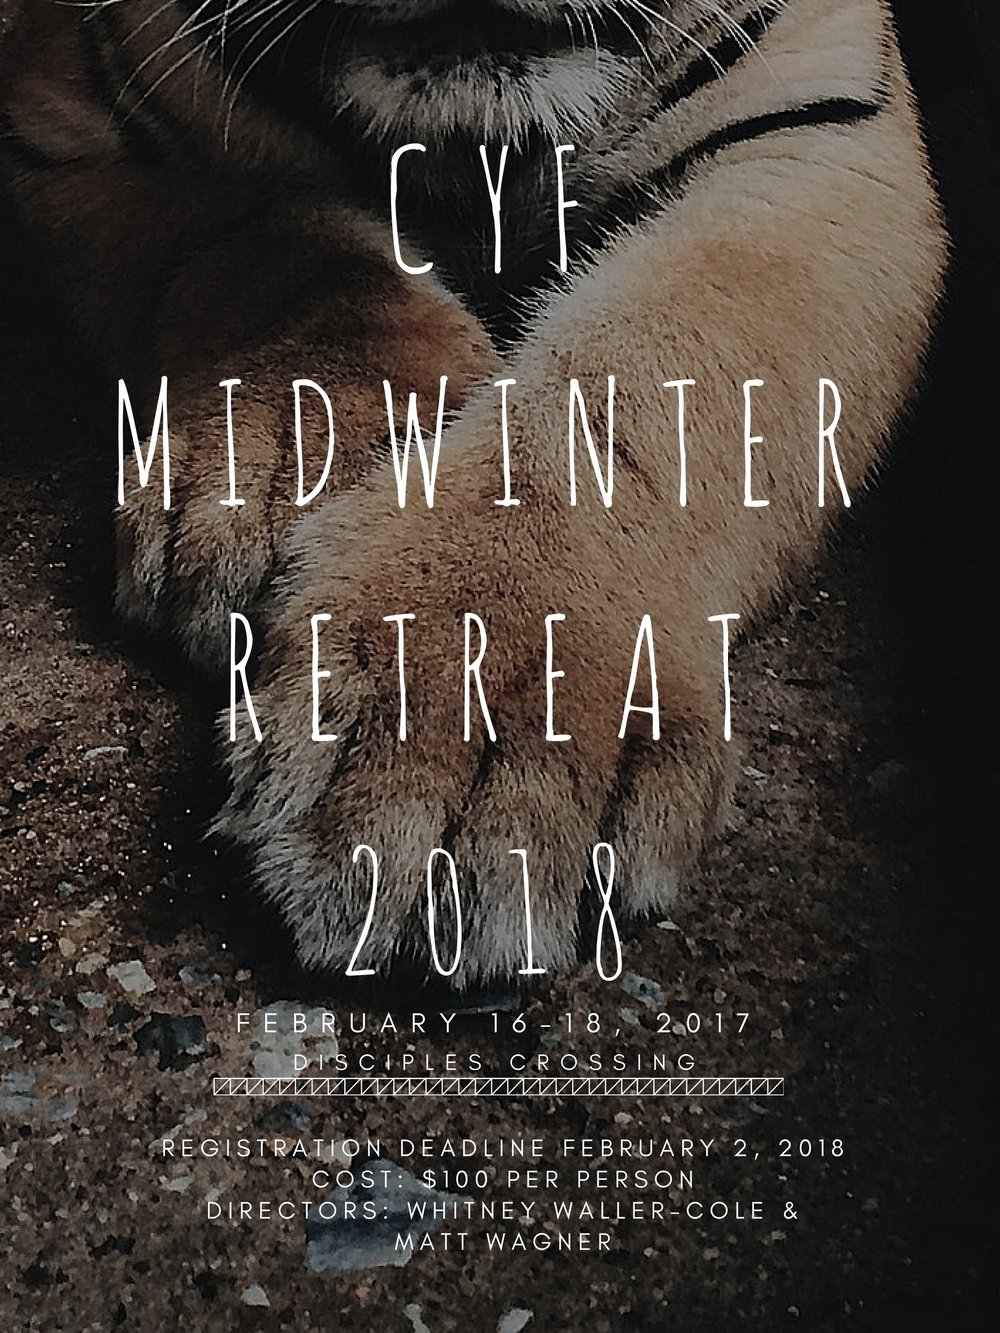 CYF Midwinter retreat 2017.jpg